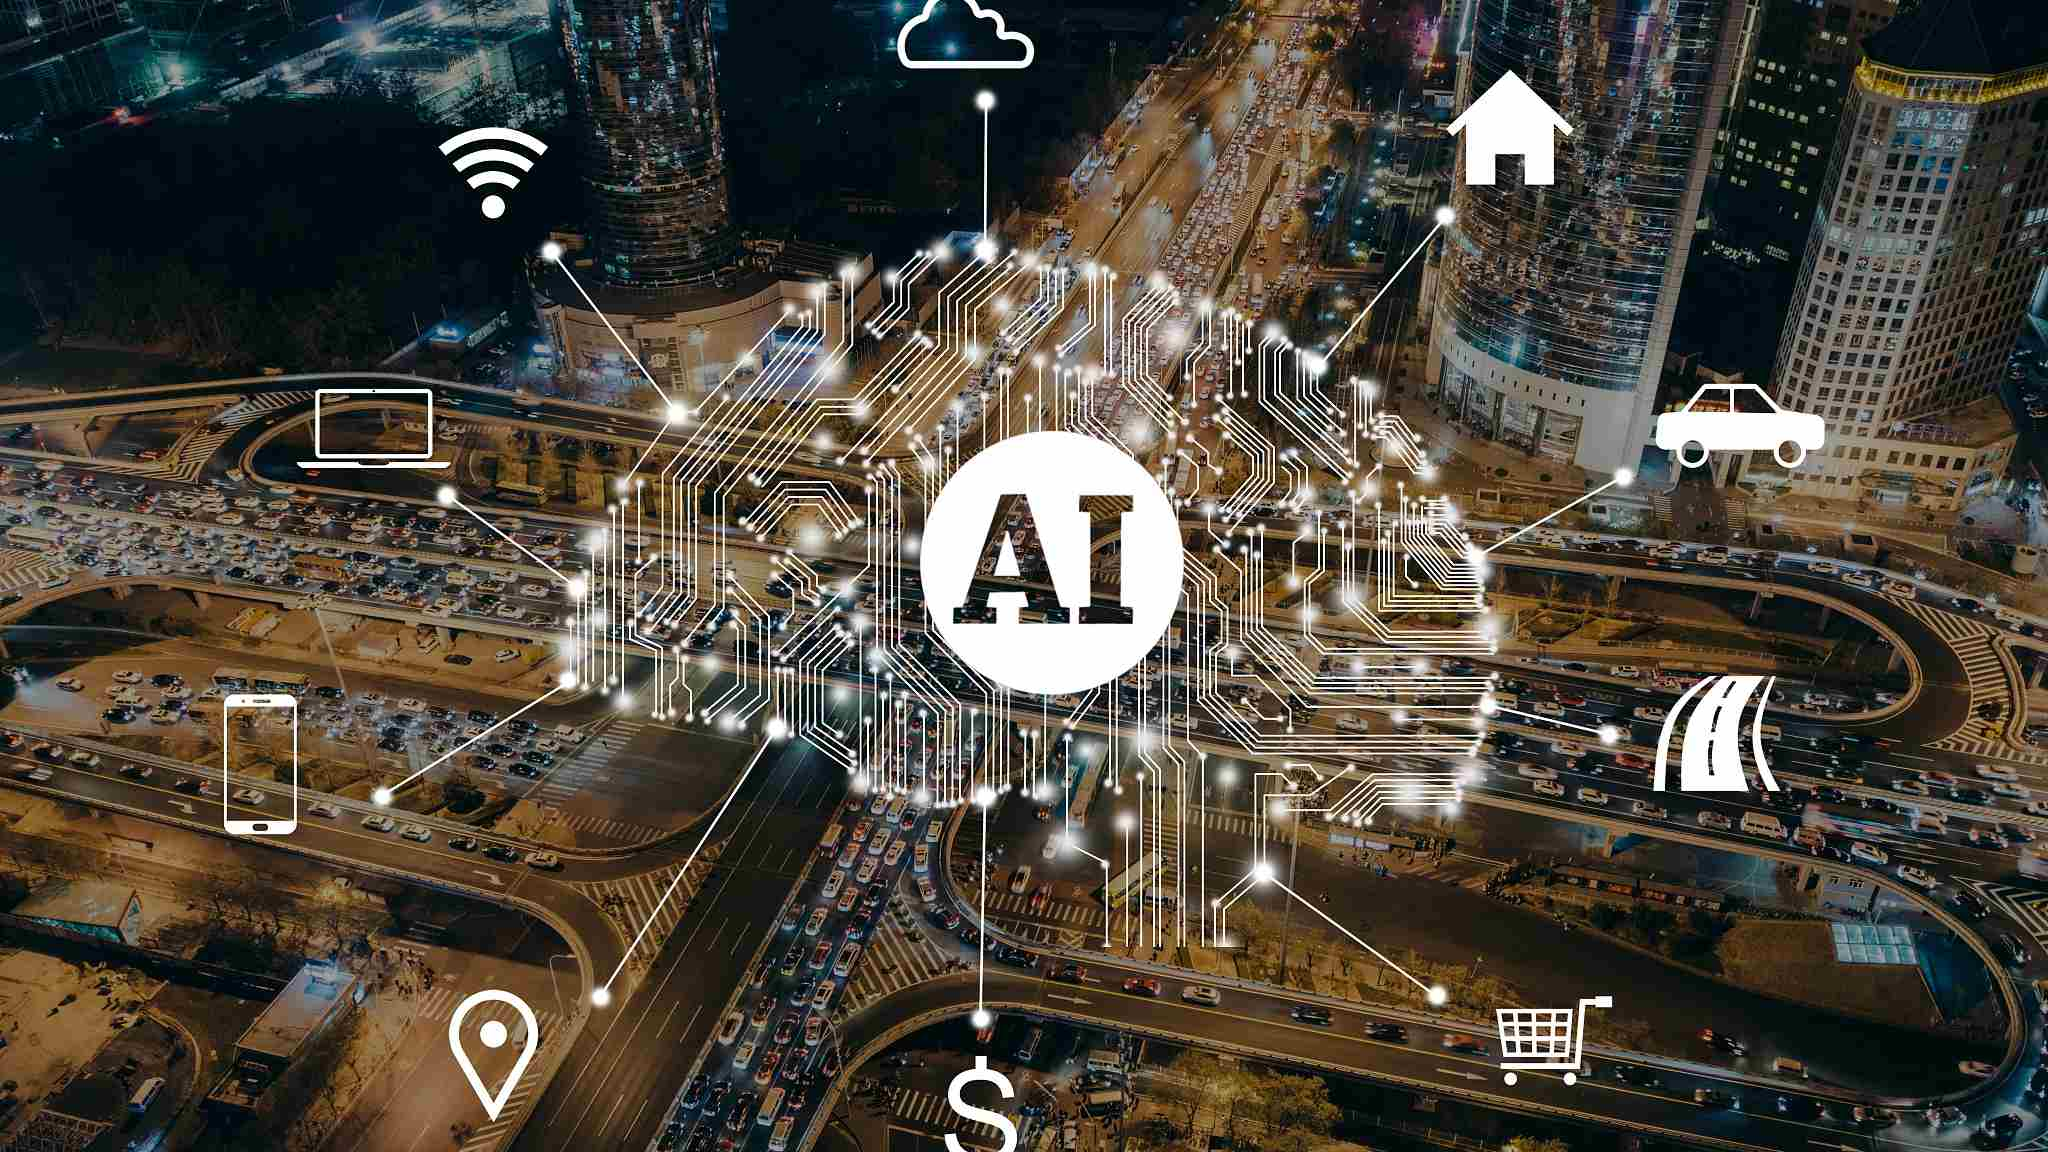 Chinese companies discuss AI at GITEX Technology Week